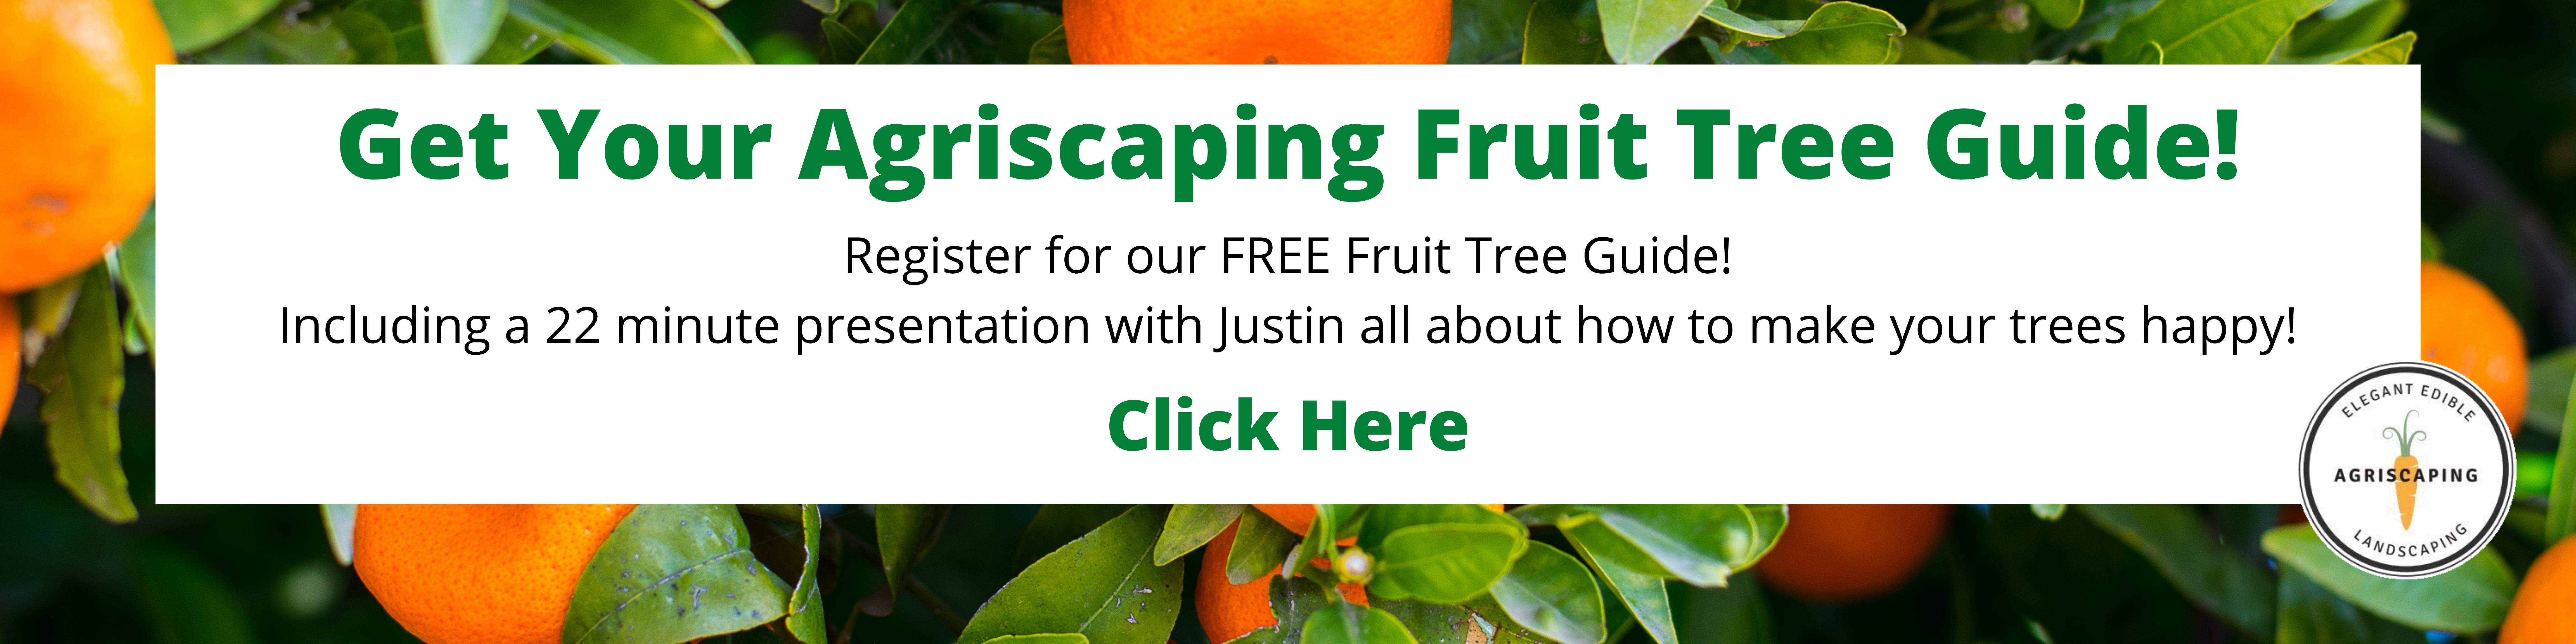 Fruit Tree Guide (1)